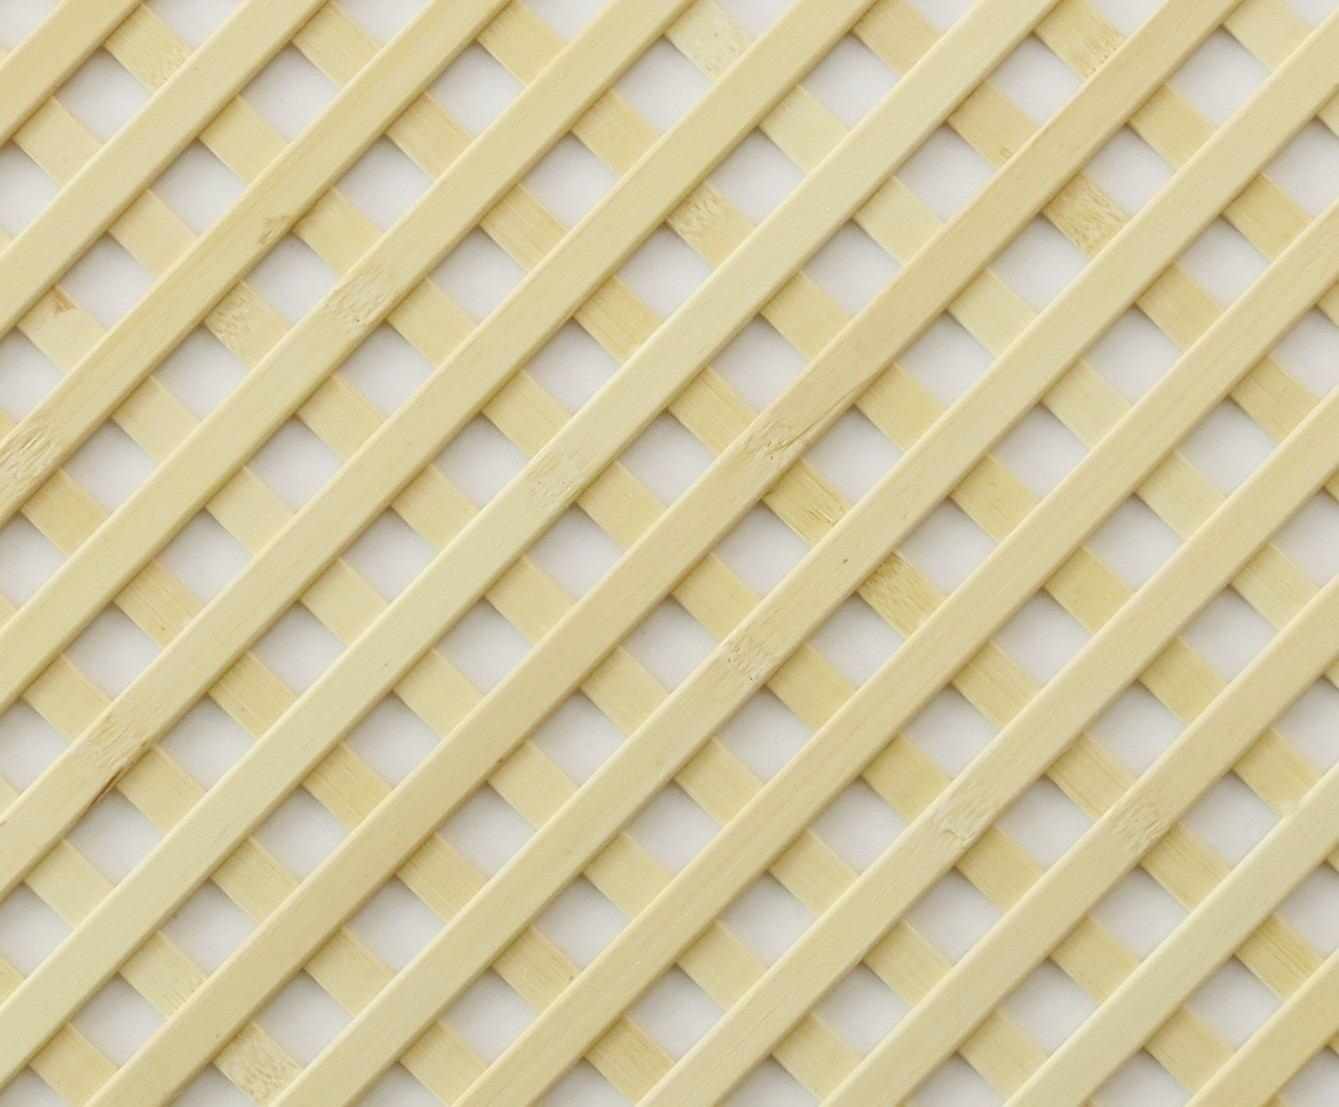 Heizkörperverkleidung Holz holzgitter 65 125cm 59 stc ziergitter heizkörperverkleidung